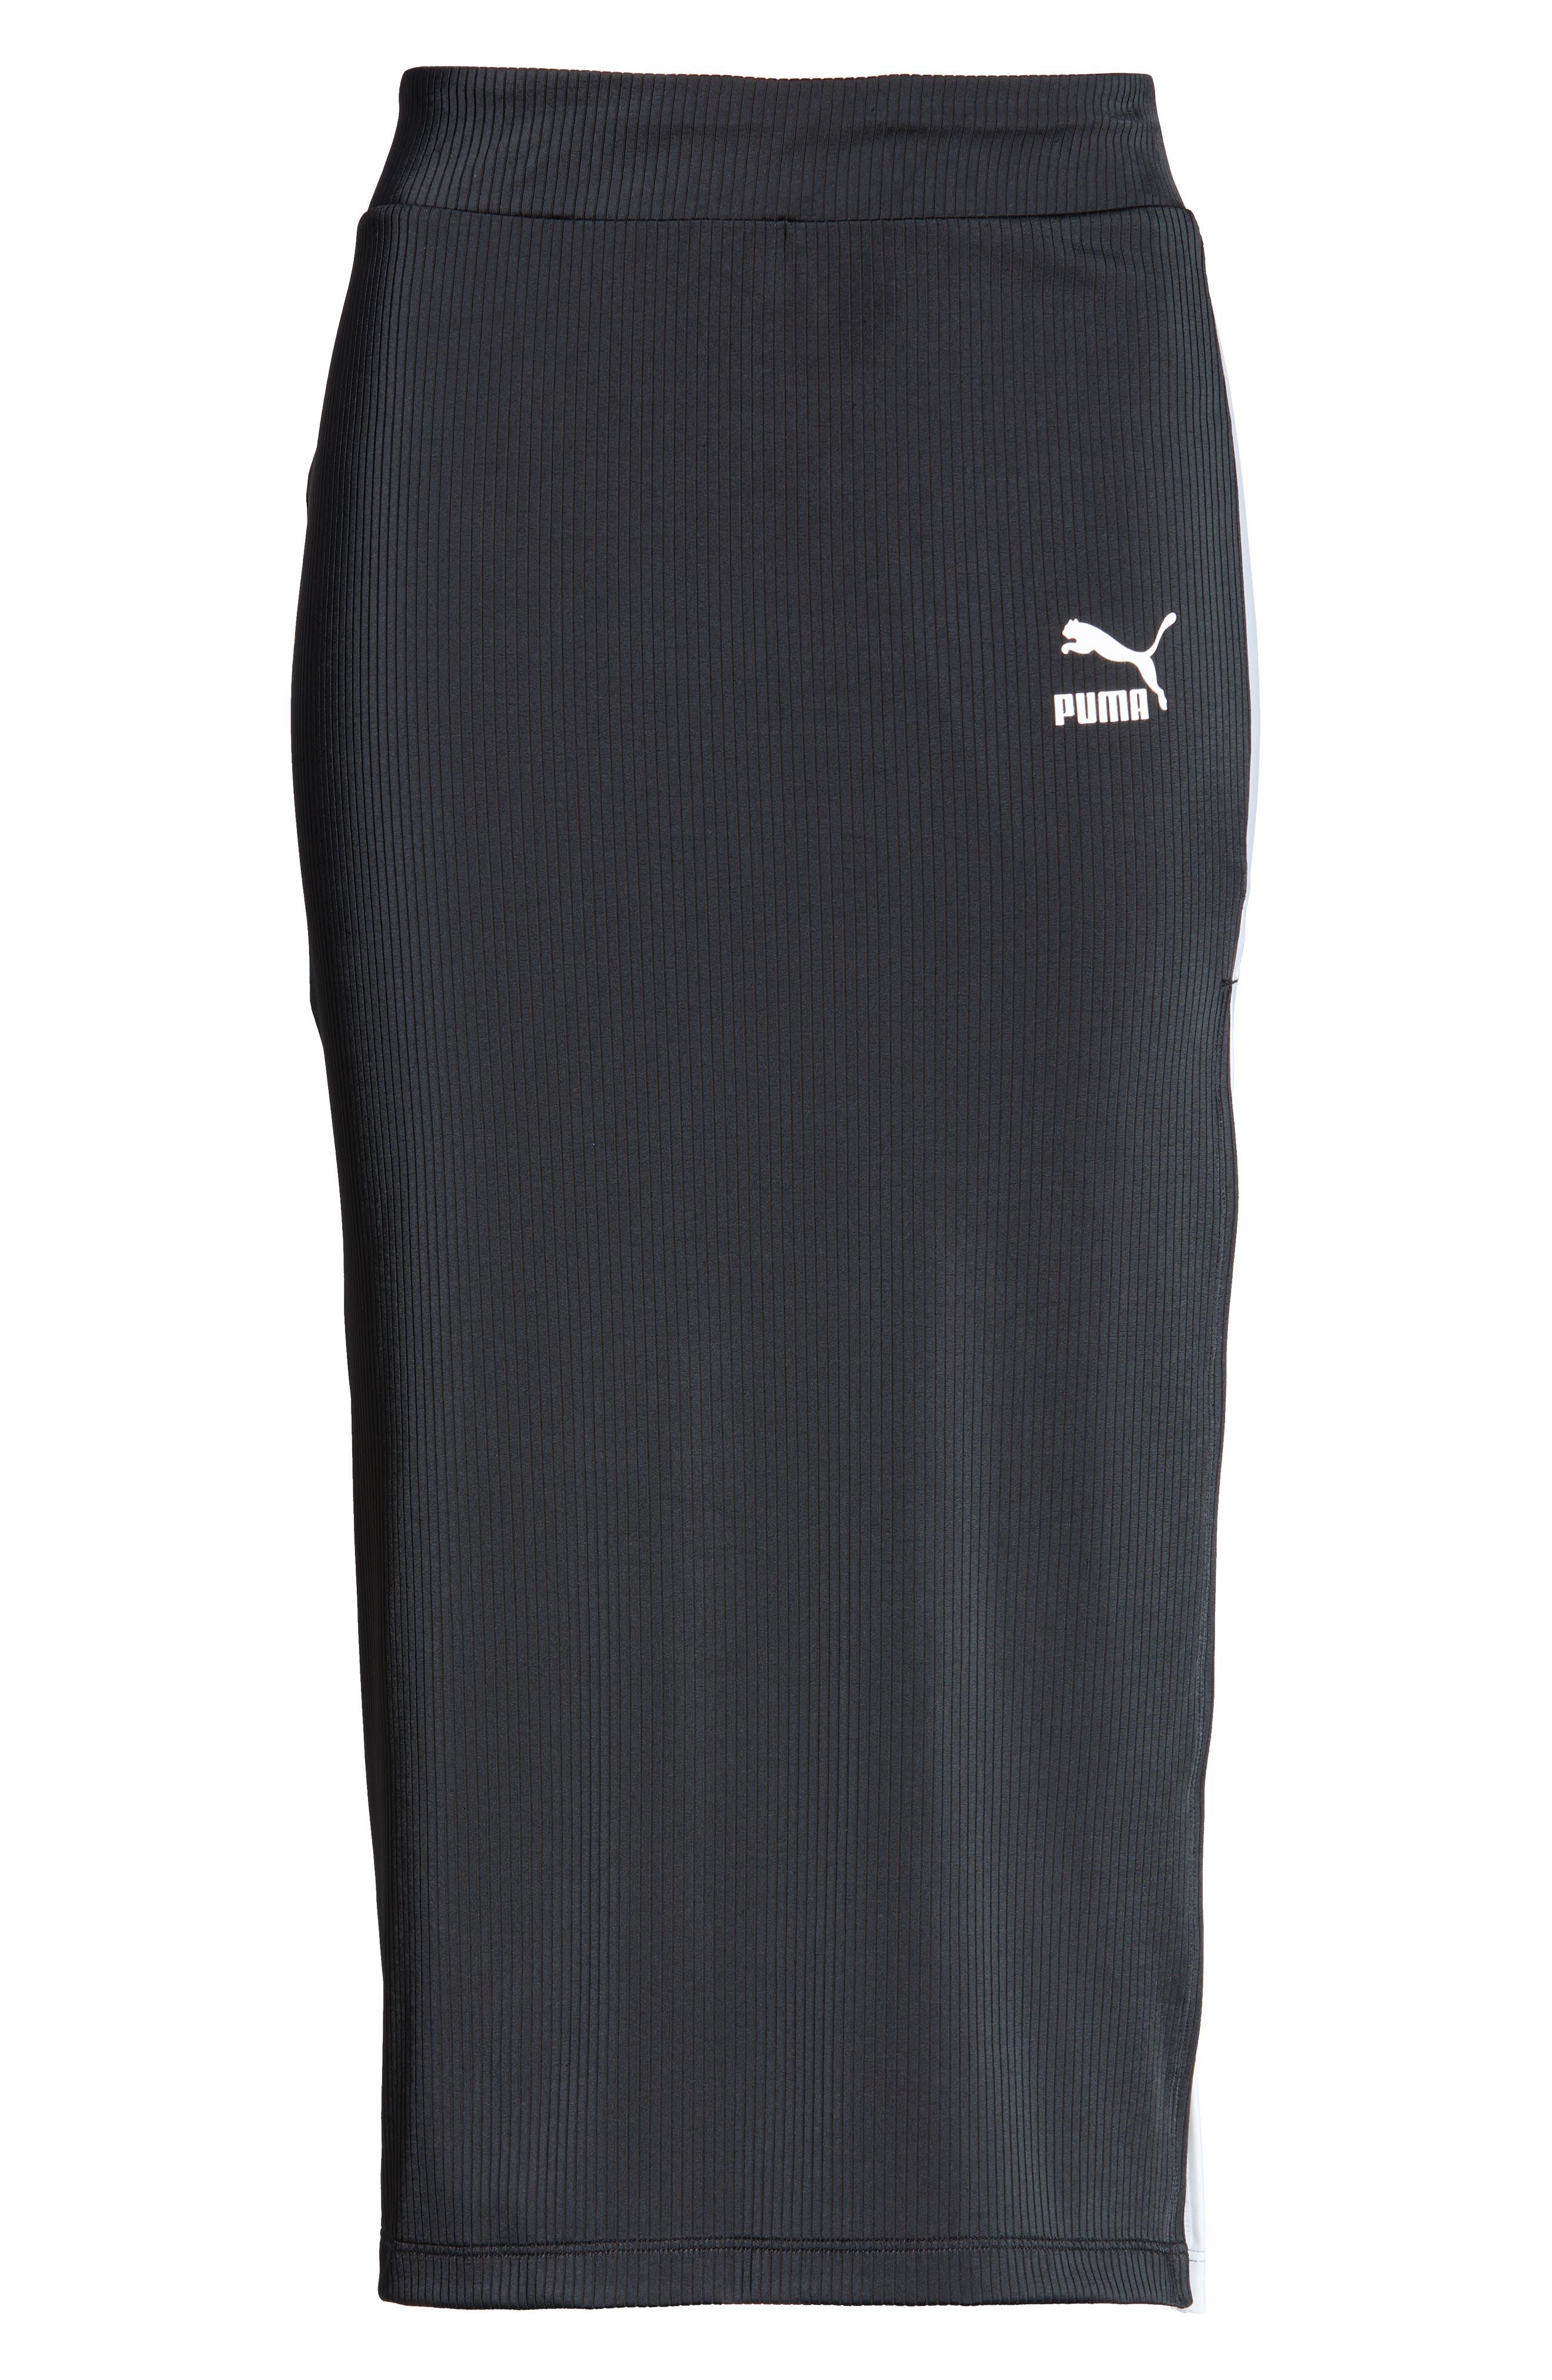 PUMA,                             Classics Ribbed Skirt,                             Alternate thumbnail 7, color,                             PUMA BLACK